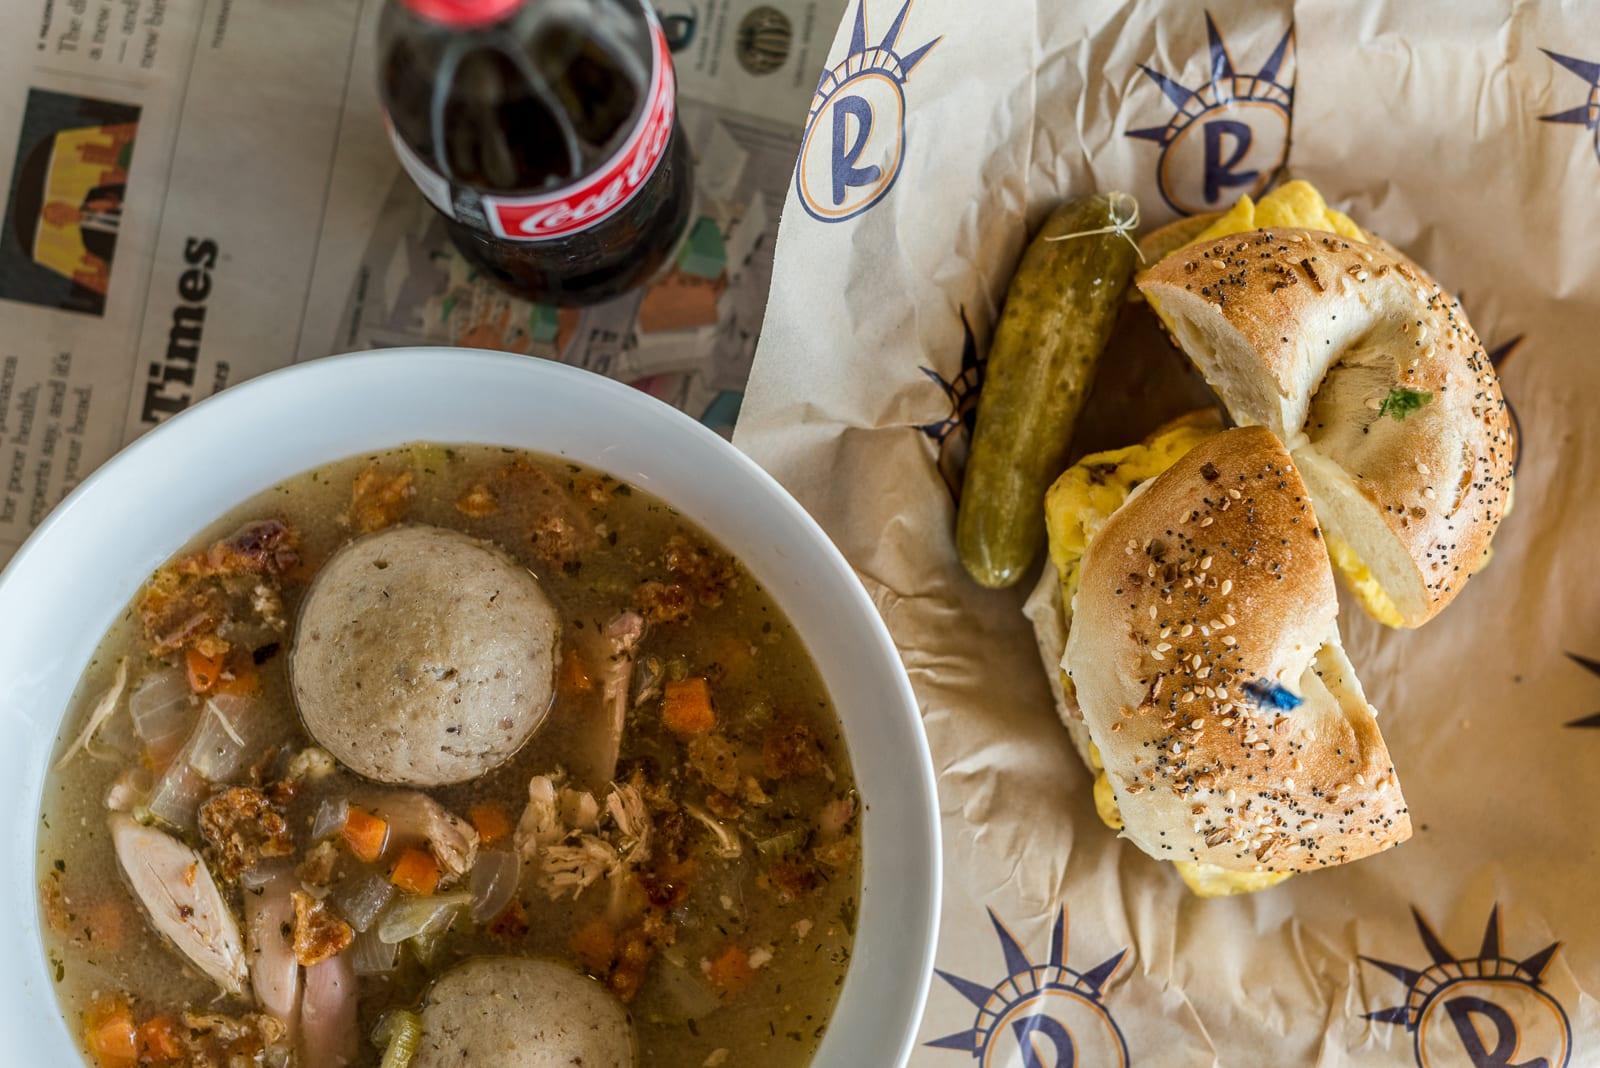 Rosenberg's Bagels | Food Photography | Rosenberg's Bagels & Delicatessen | From the Hip Photo